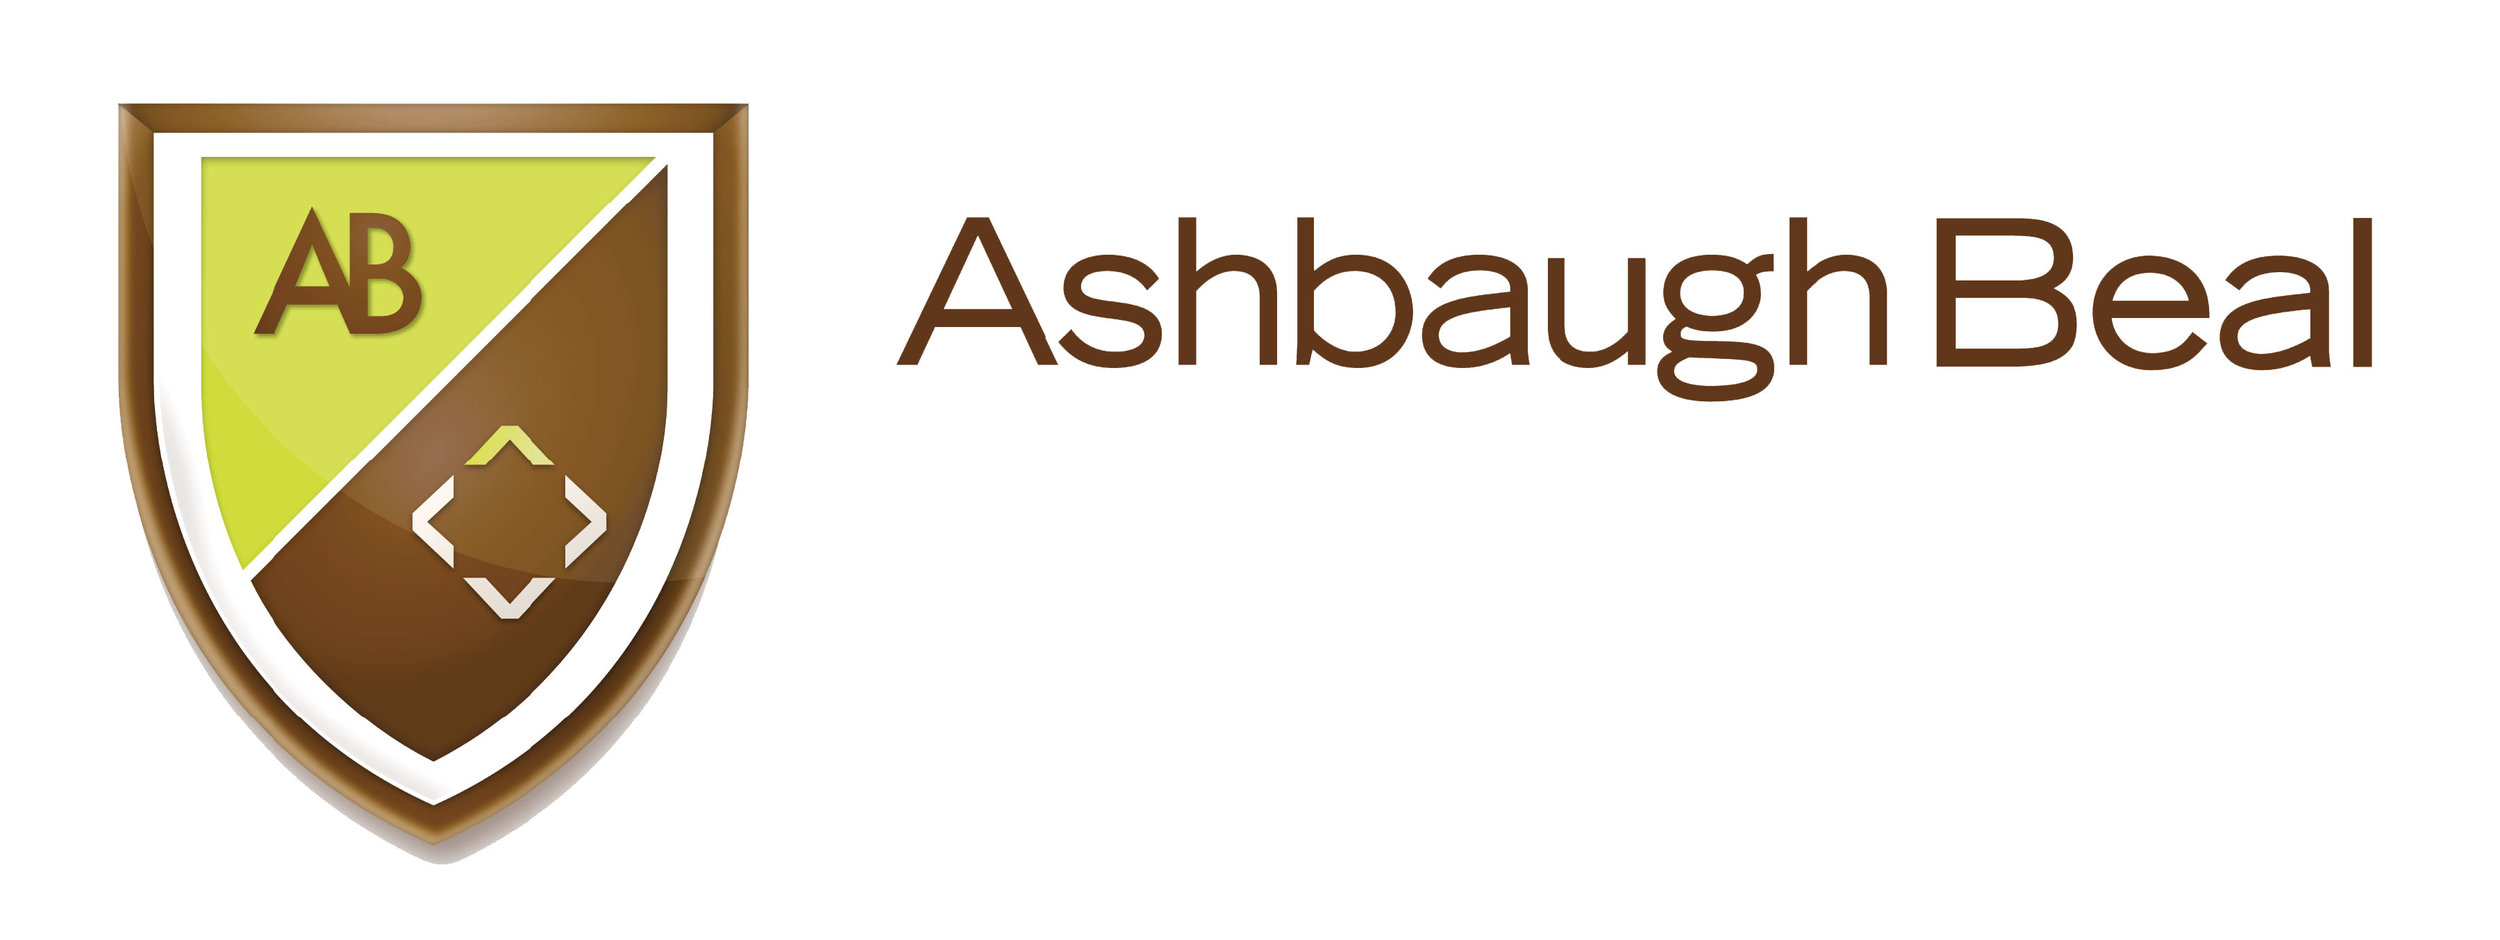 Ashbaugh-Beal-2015-CCS---LOGO---3D.jpg